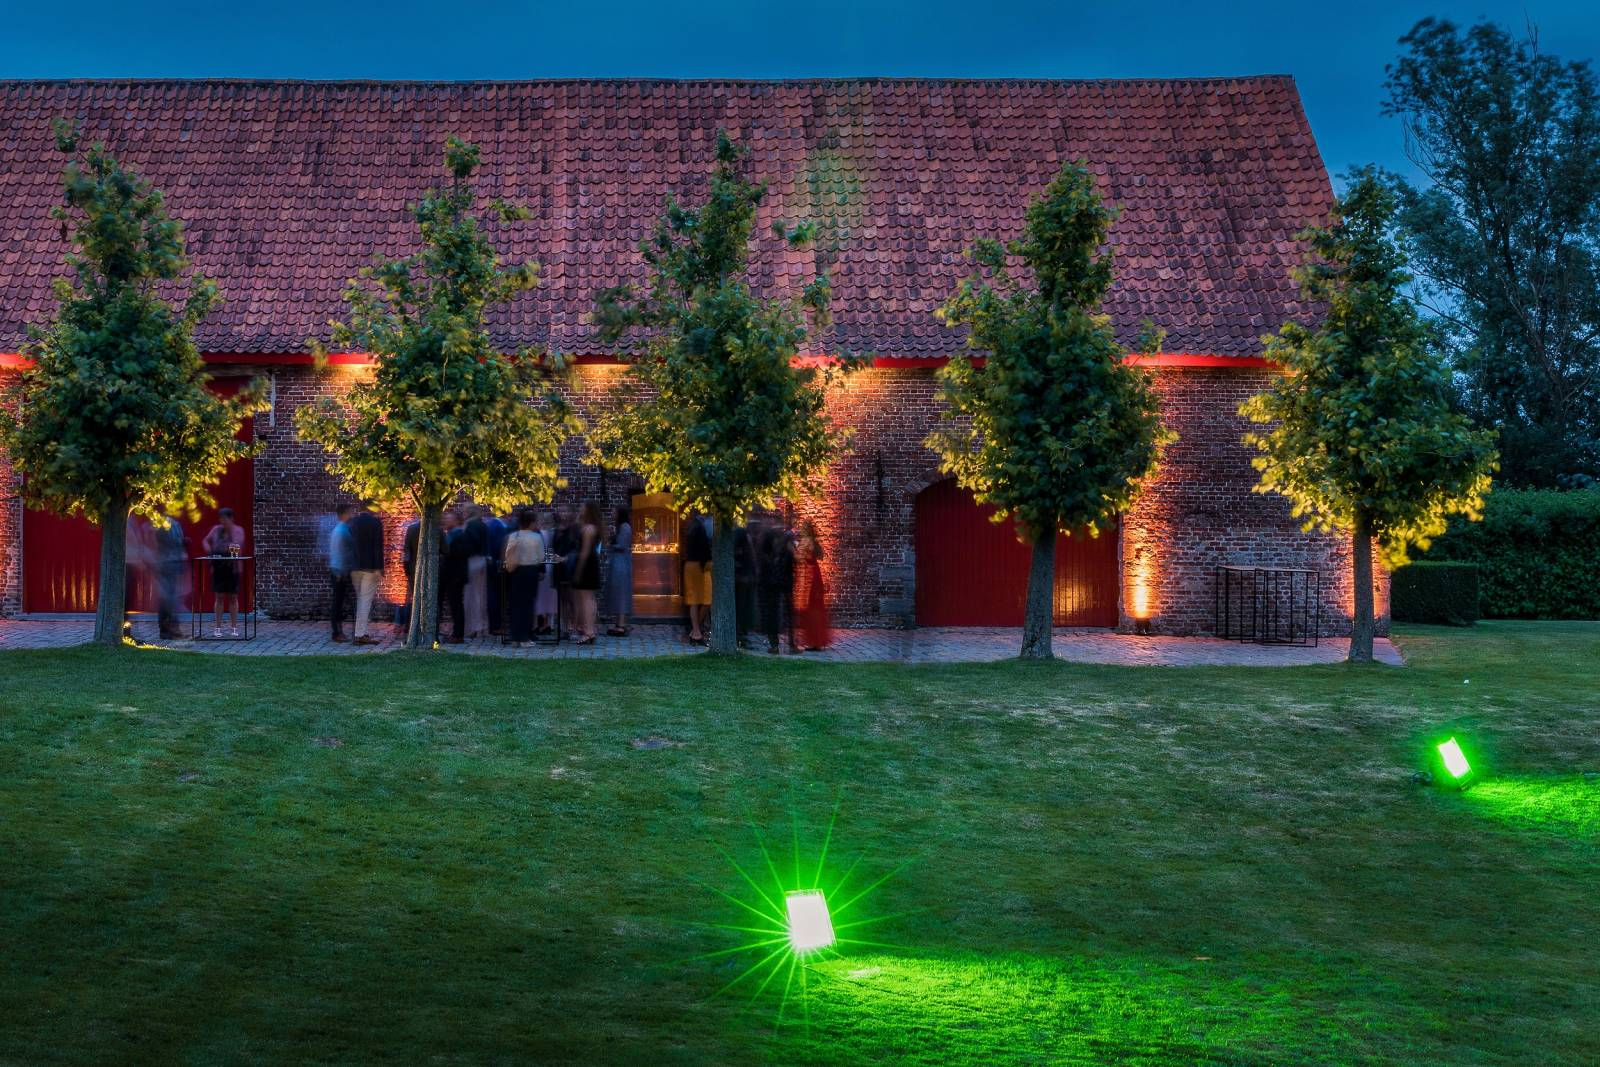 John & Jane - Licht&Geluid - Fotograaf Jurgen_de_Witte - House of Weddings - 7